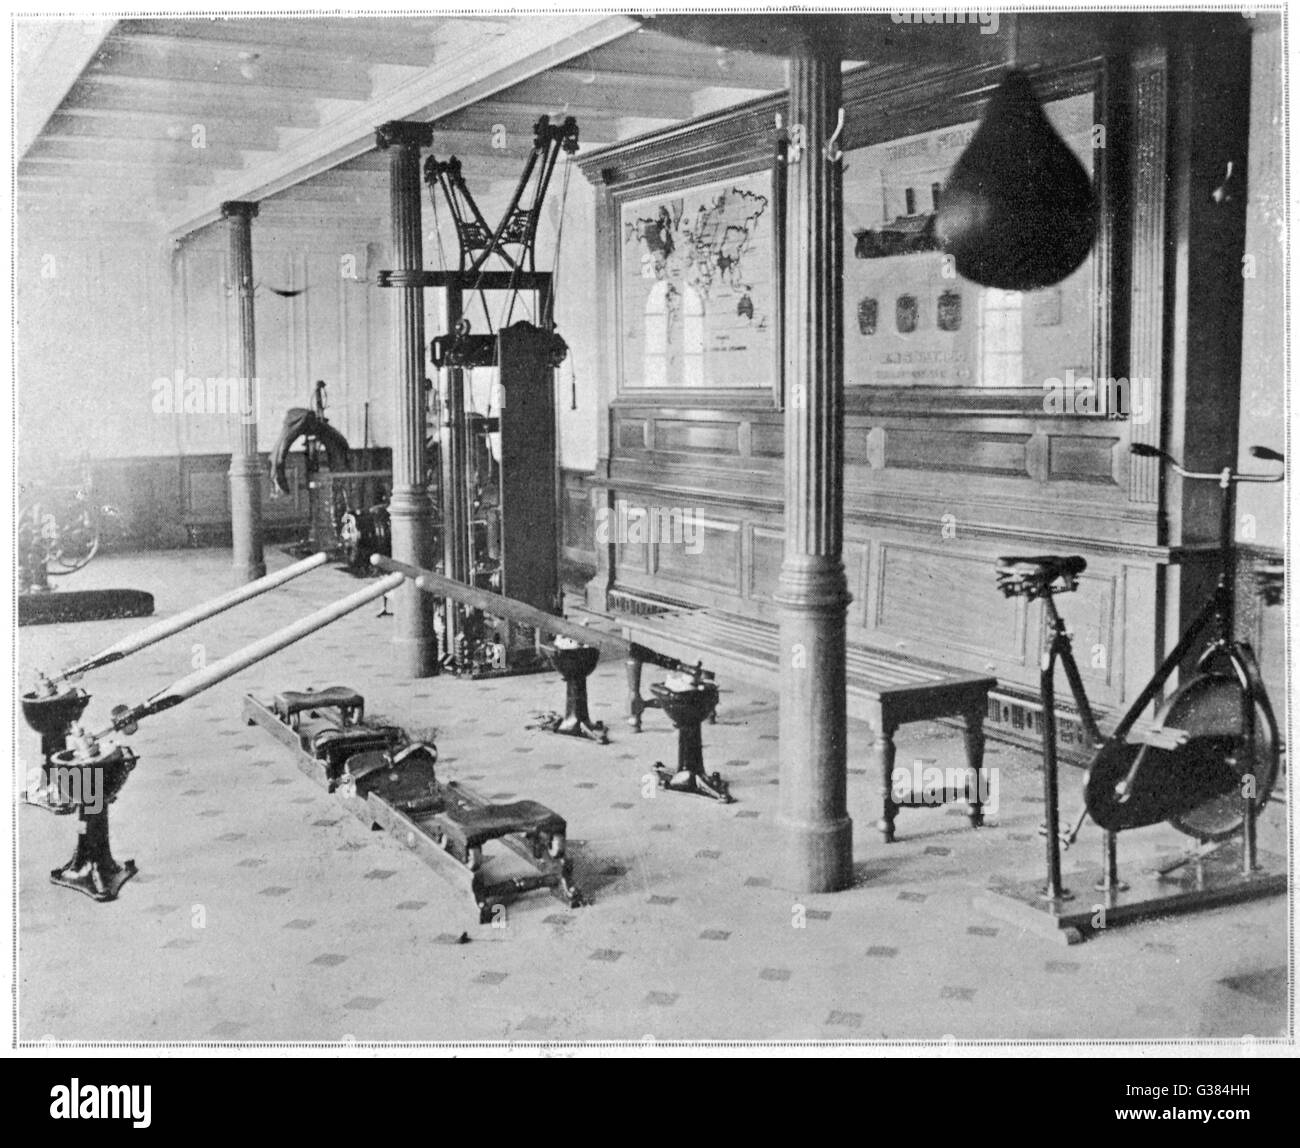 Das Gymnasium der Titanic.          Datum: 1912 Stockbild